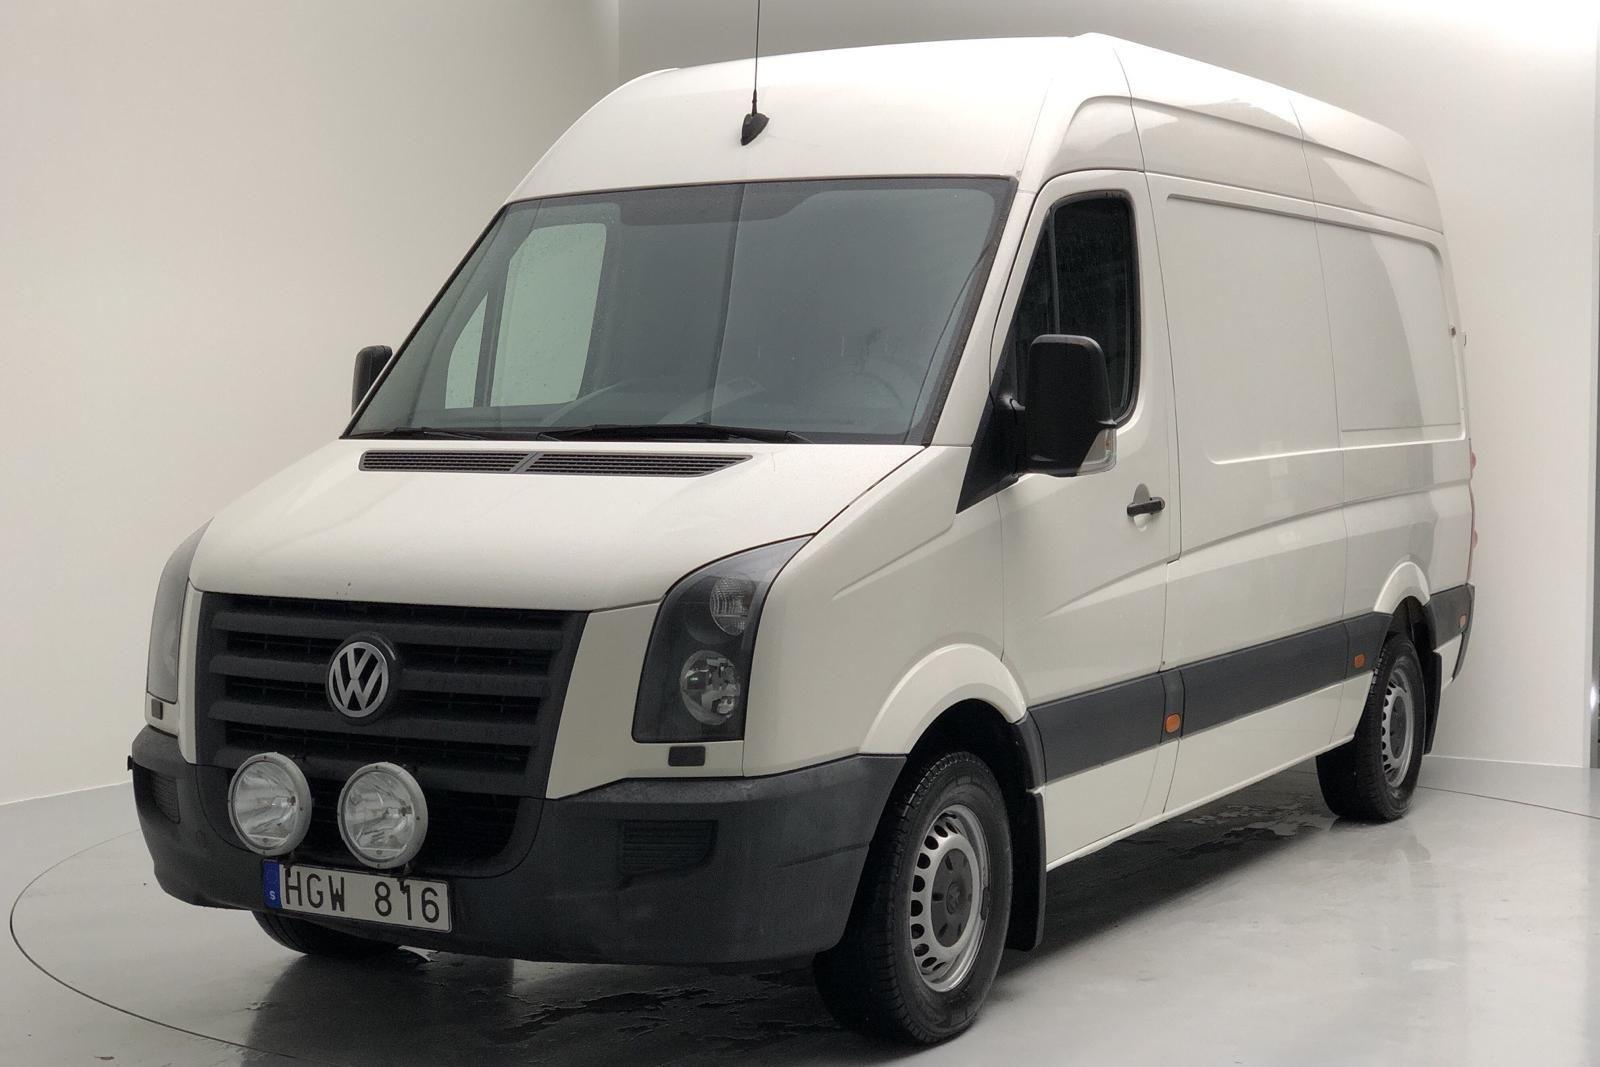 VW Crafter 35 2.5 TDI Skåp (136hk)